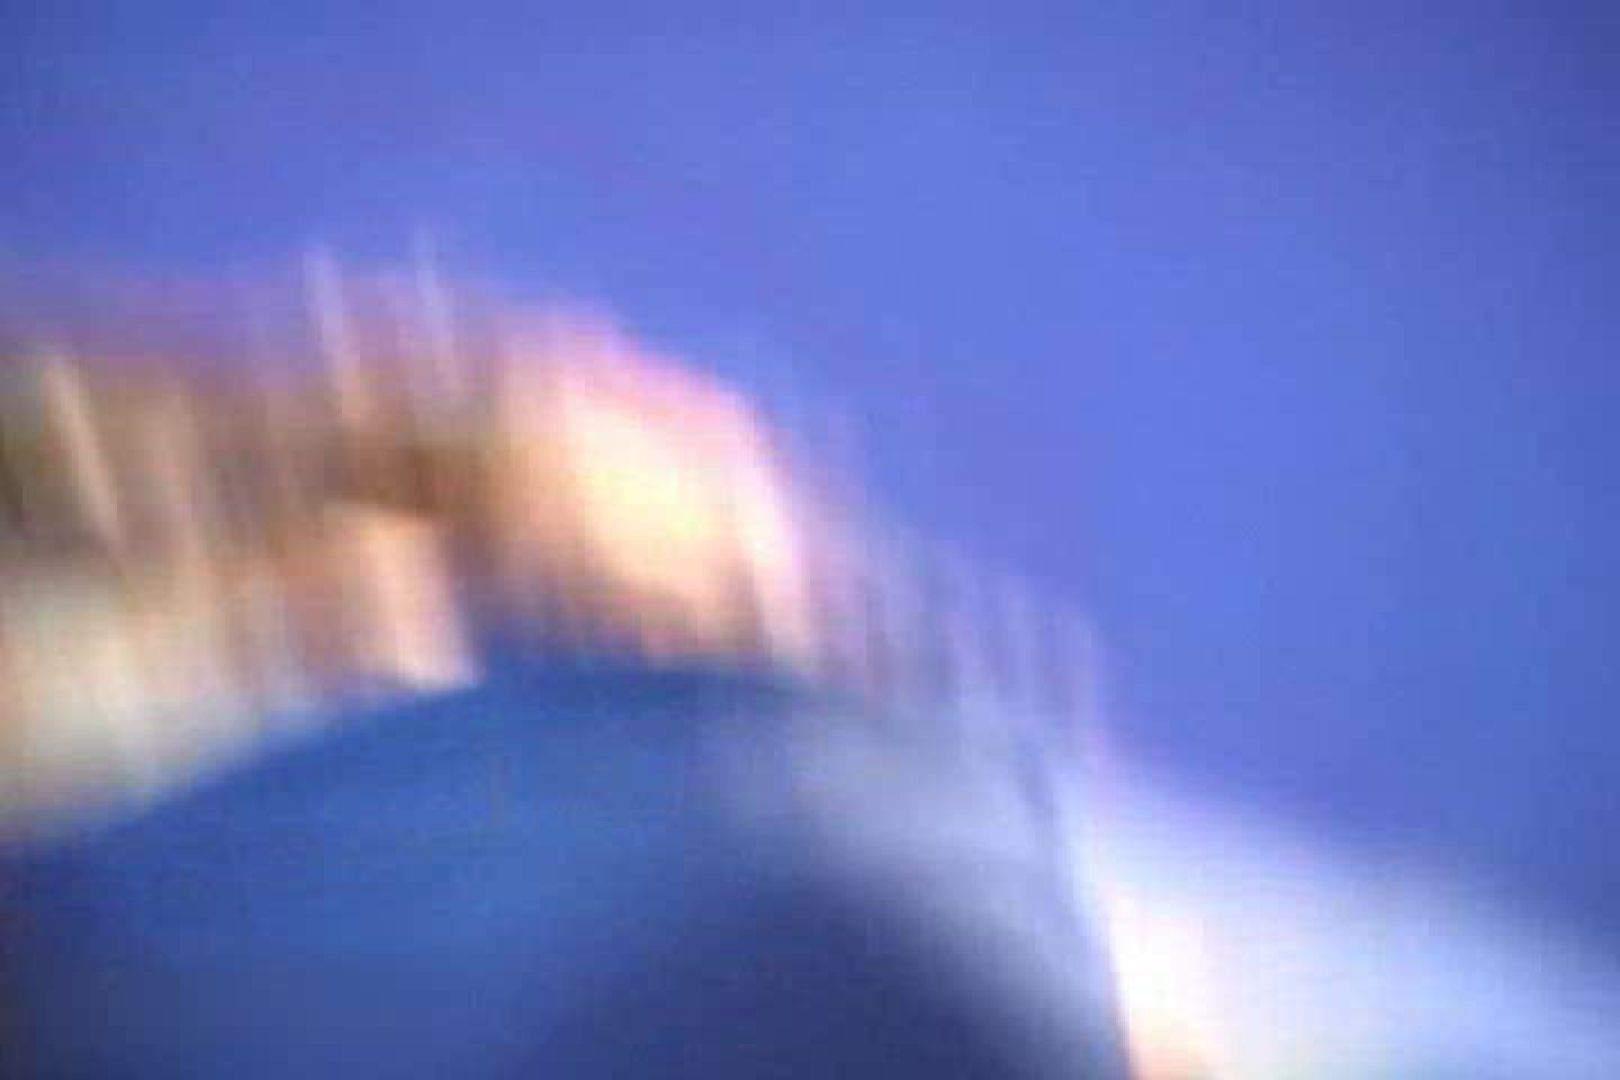 RQカメラ地獄Vol.34 小悪魔ギャル  101連発 76